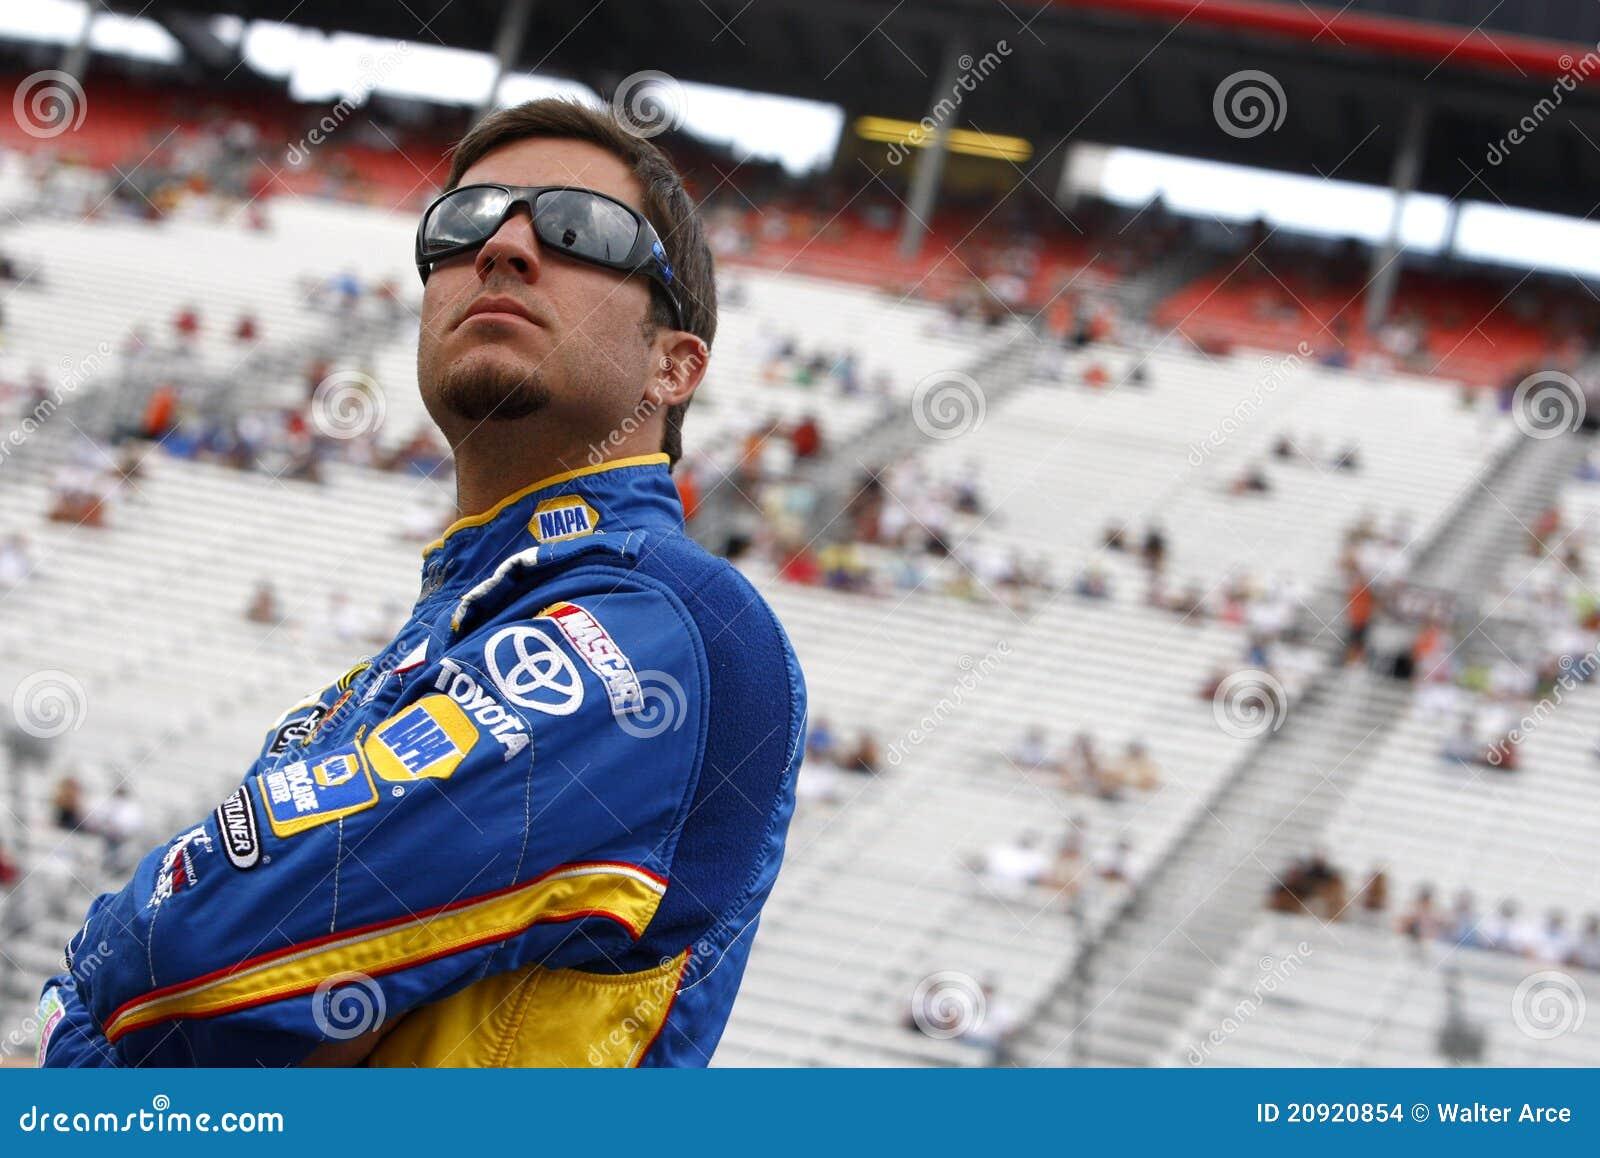 NASCAR: Aug 26 Irwin Tools Night Race